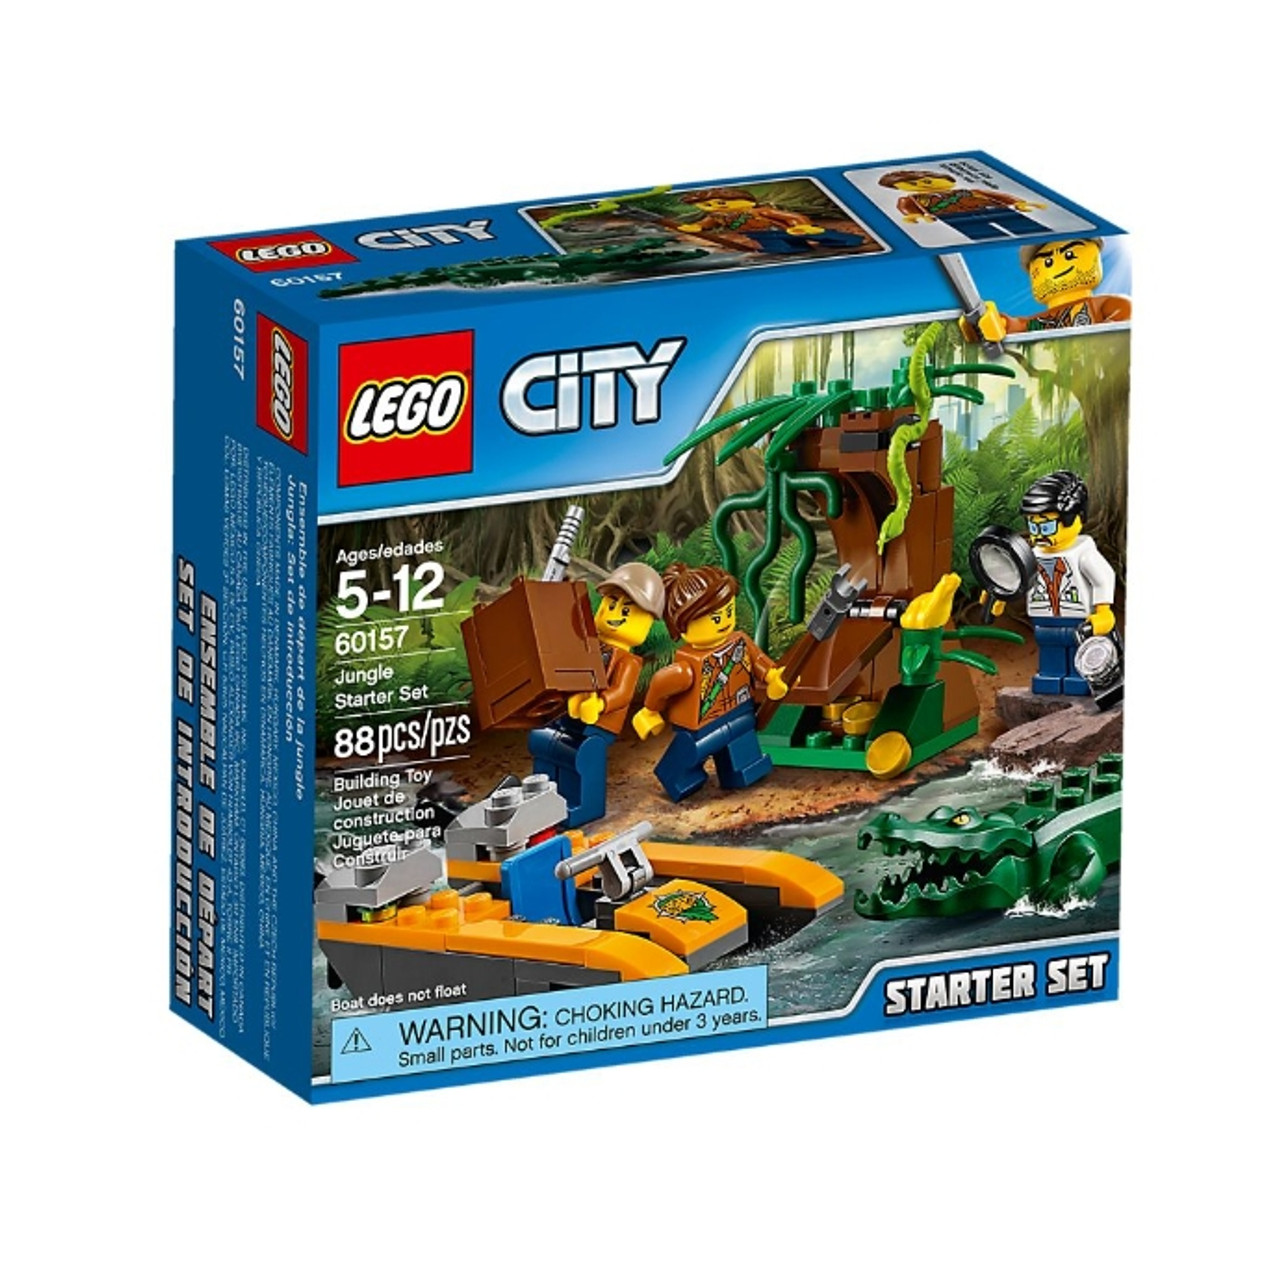 Jungle Set 60157 Starter Lego Lego qMpGzVSU